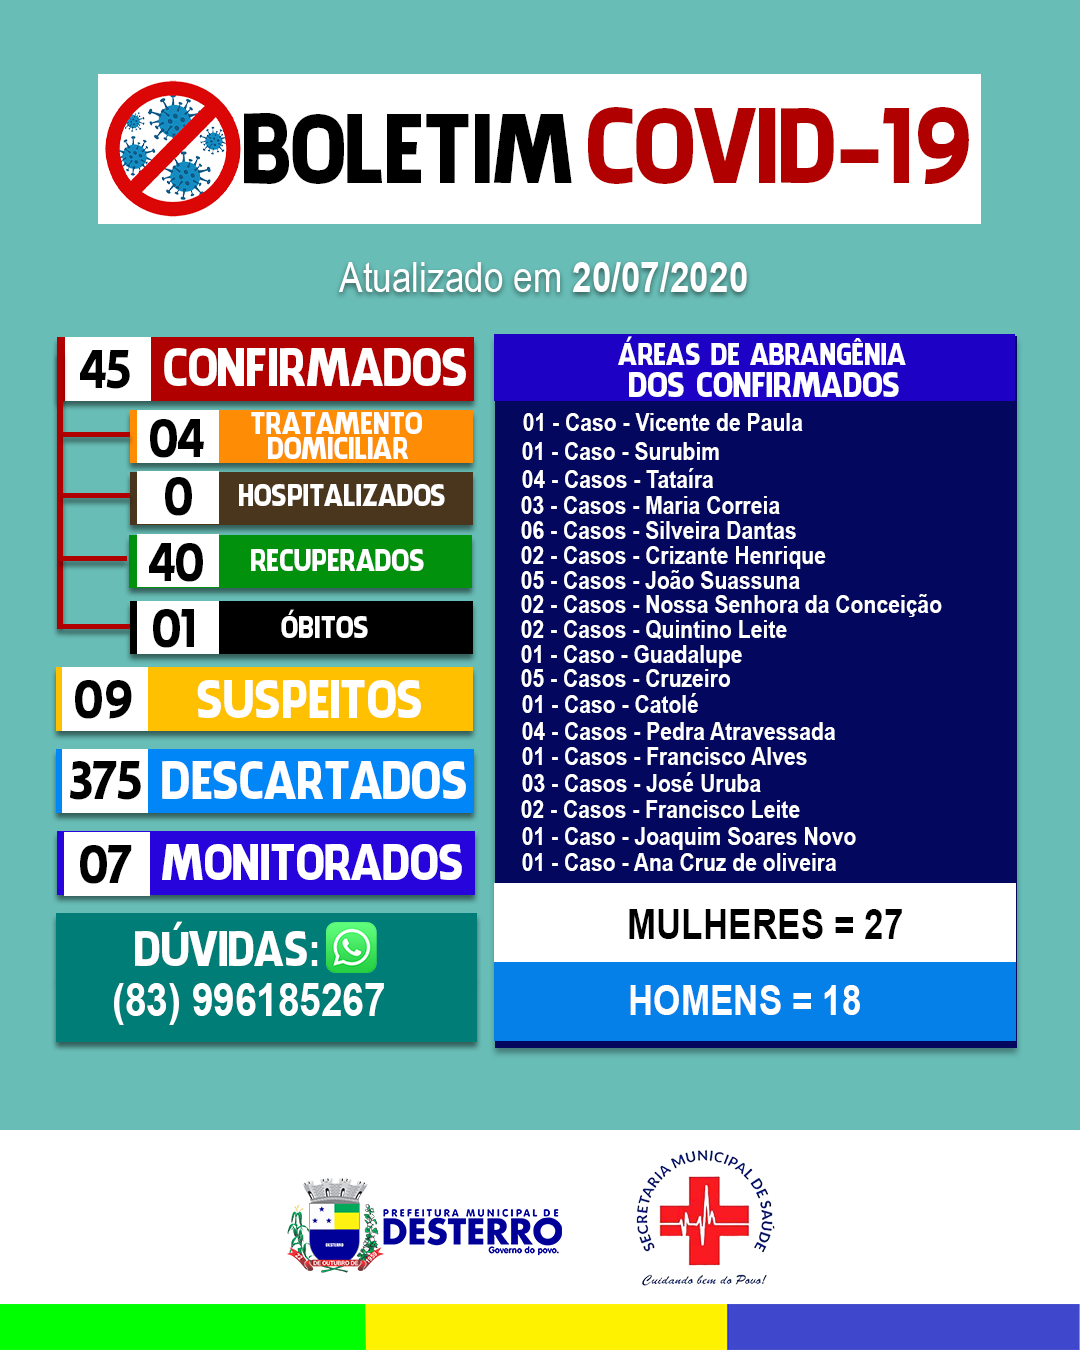 Boletim Covid-19 (20/07/2020)